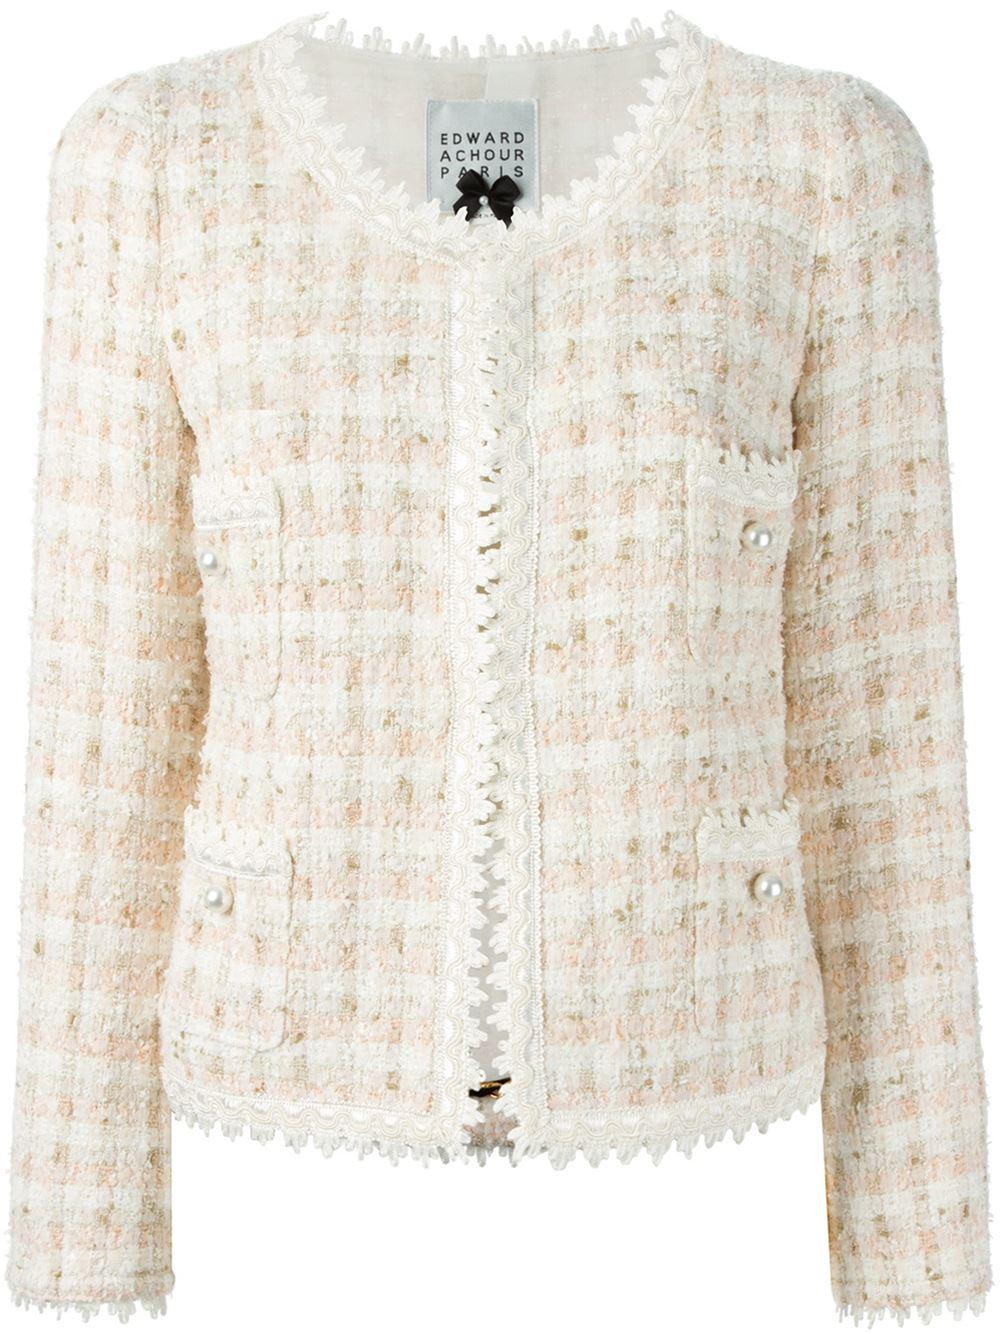 96930539d08f6 Lyst - Edward Achour Paris Classic Tweed Jacket in Natural